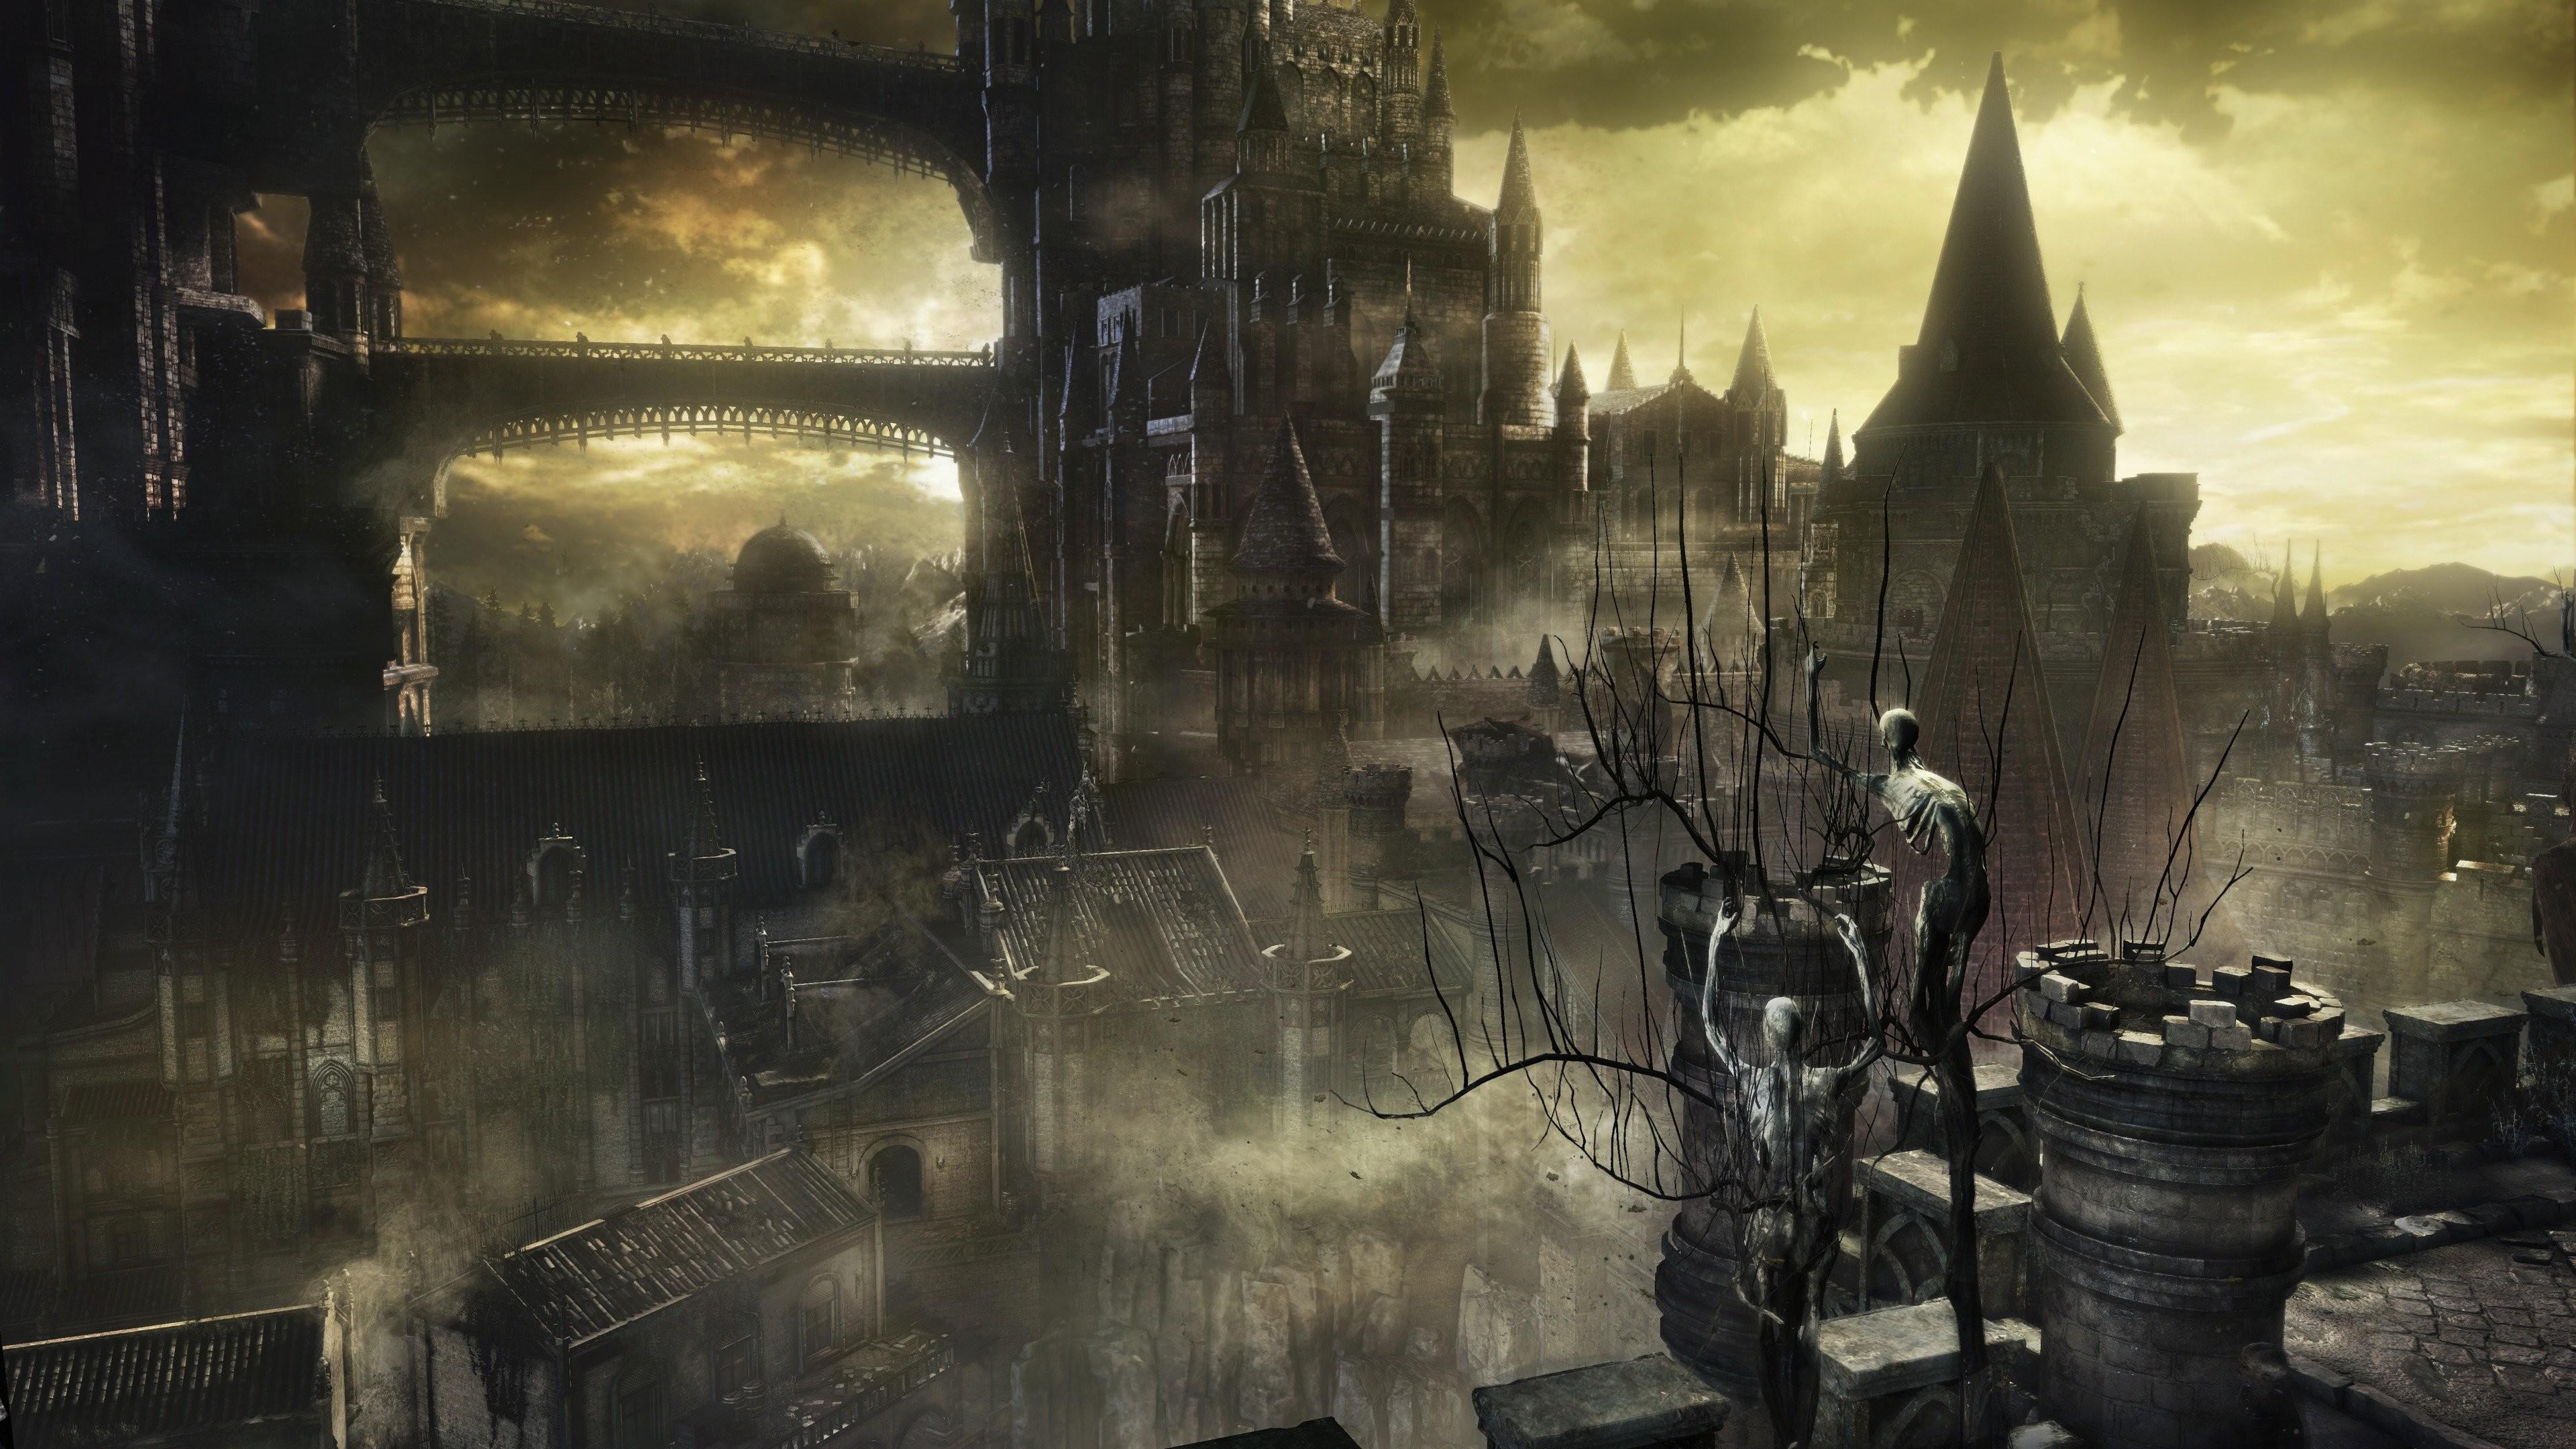 Dark Souls Wallpaper 1366x768 67 Images